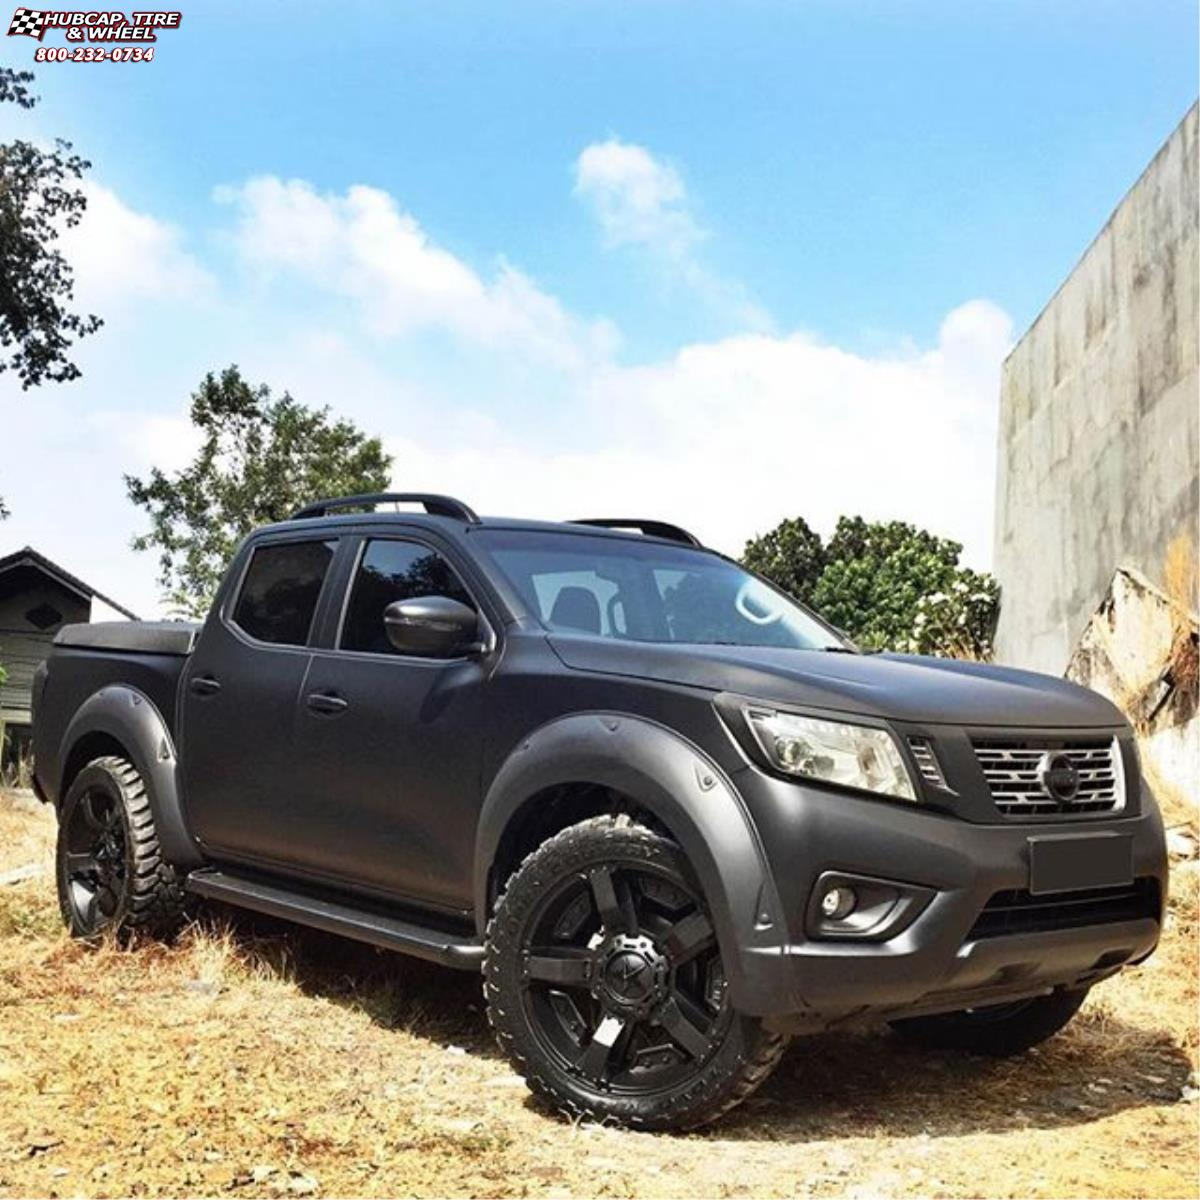 Nissan Frontier Xd Series Xd811 Rockstar 2 Wheels Satin